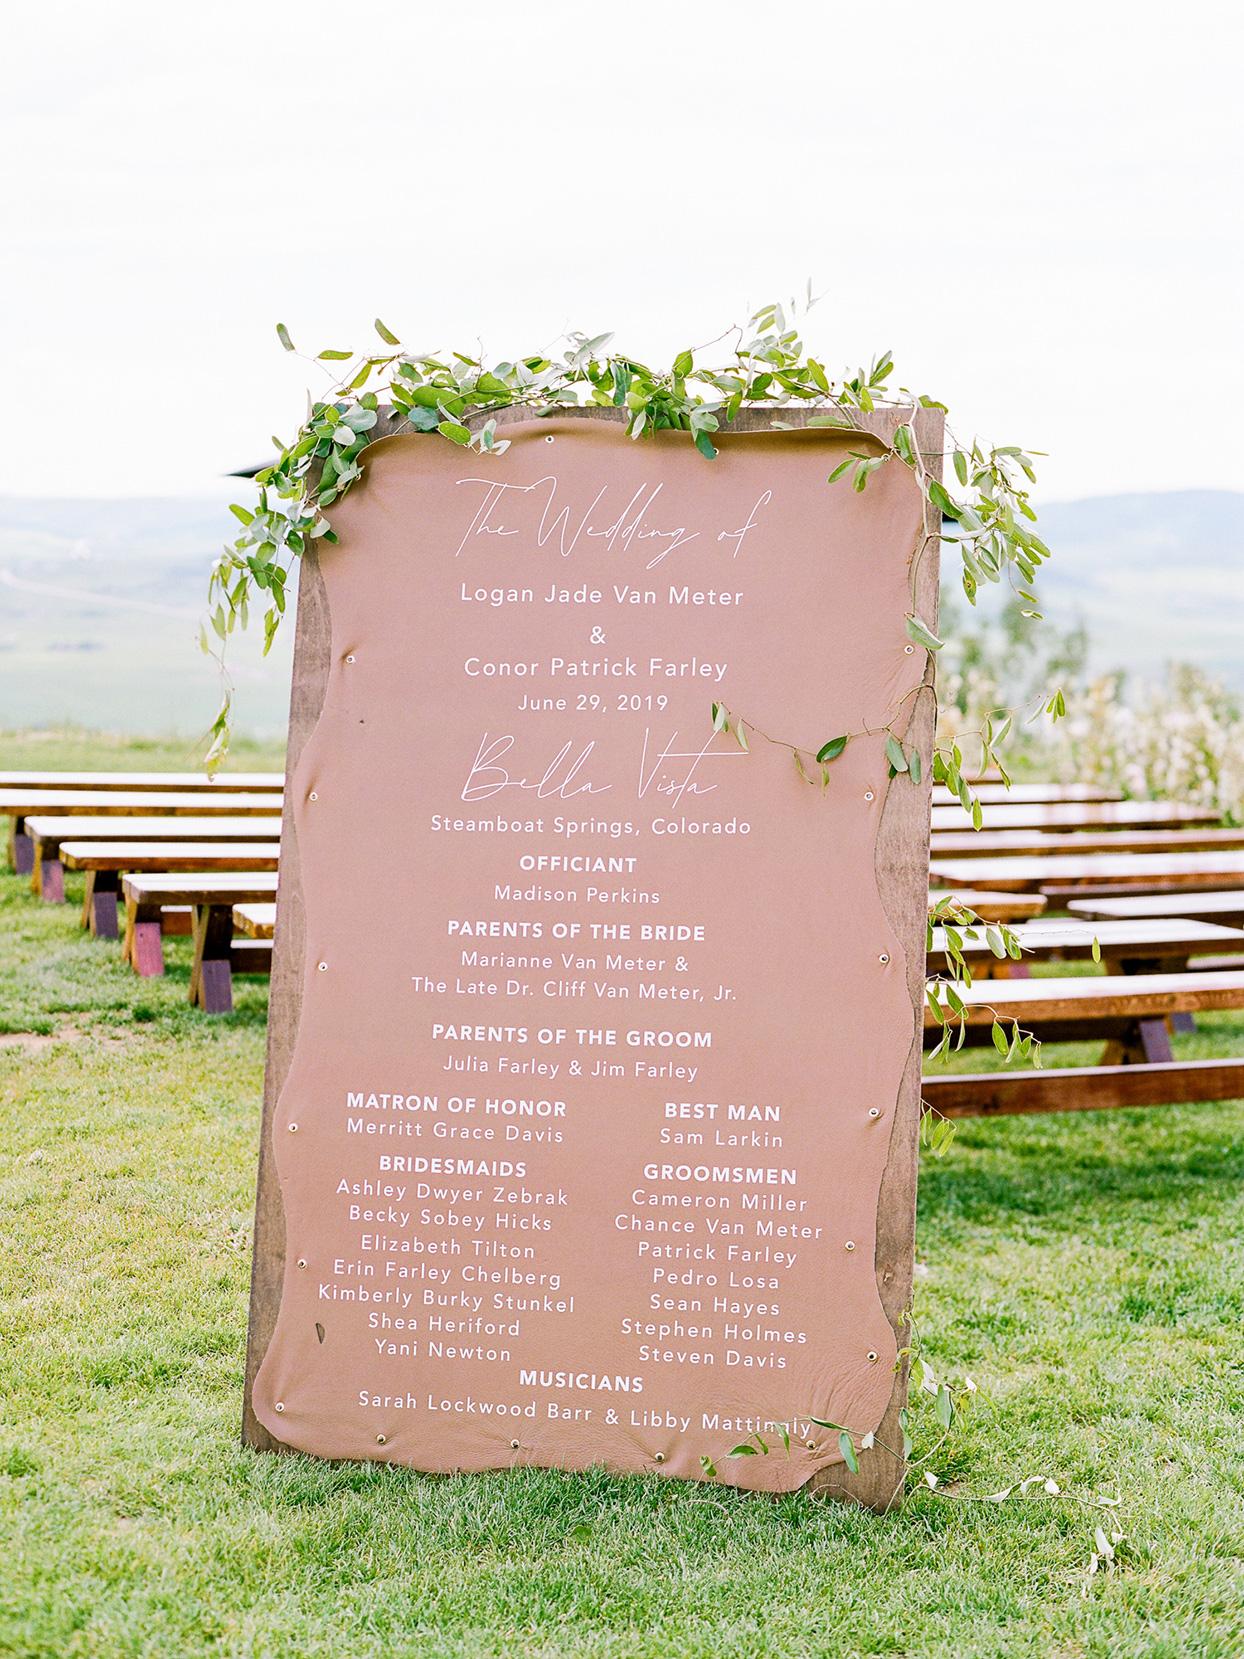 logan conor wedding ceremony program sign